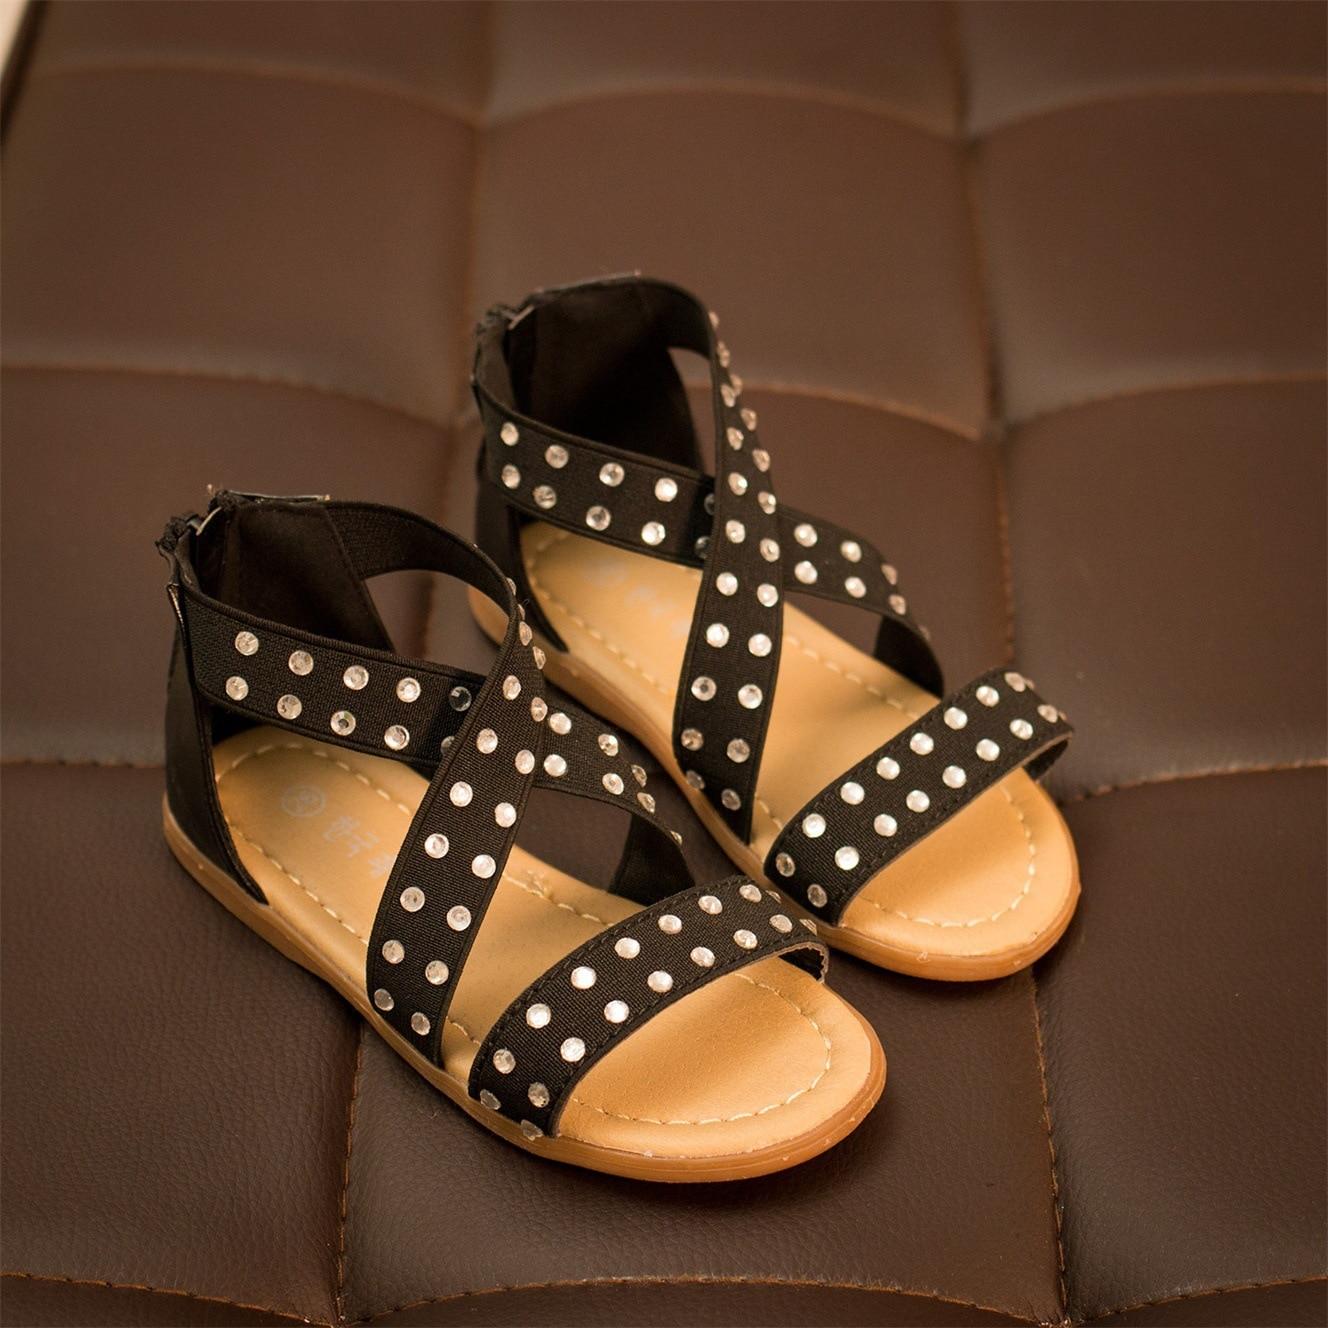 2016 Summer Waterproof Outdoor Children Sandals Girls Soft Leather Flat Heels Rhinestone Baby Boys Kids Shoes Sandal